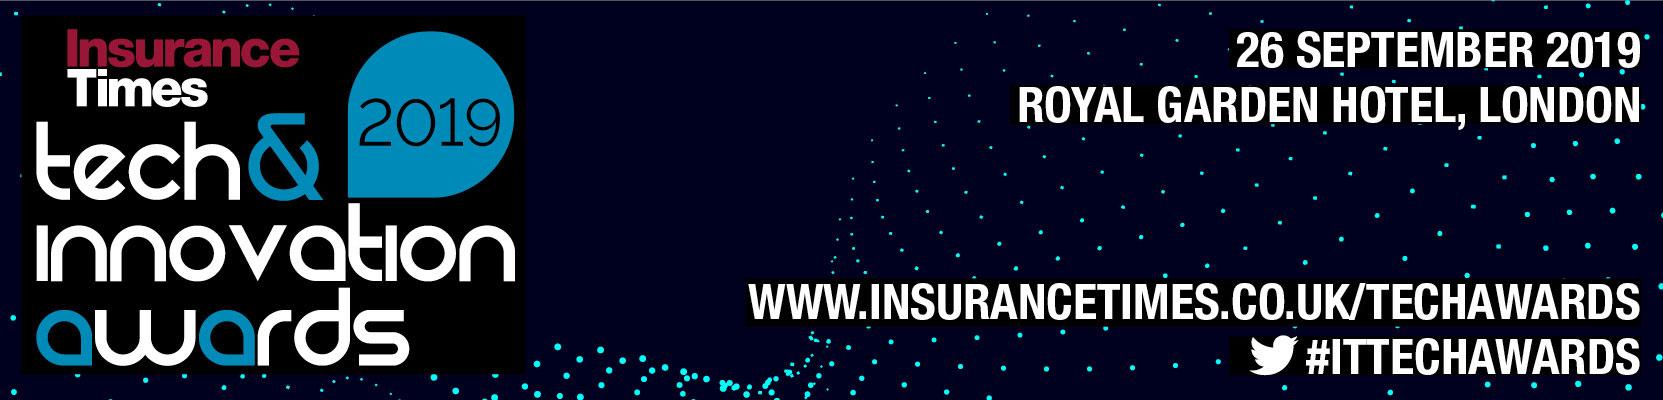 Insurance Times Tech & Innovation Awards